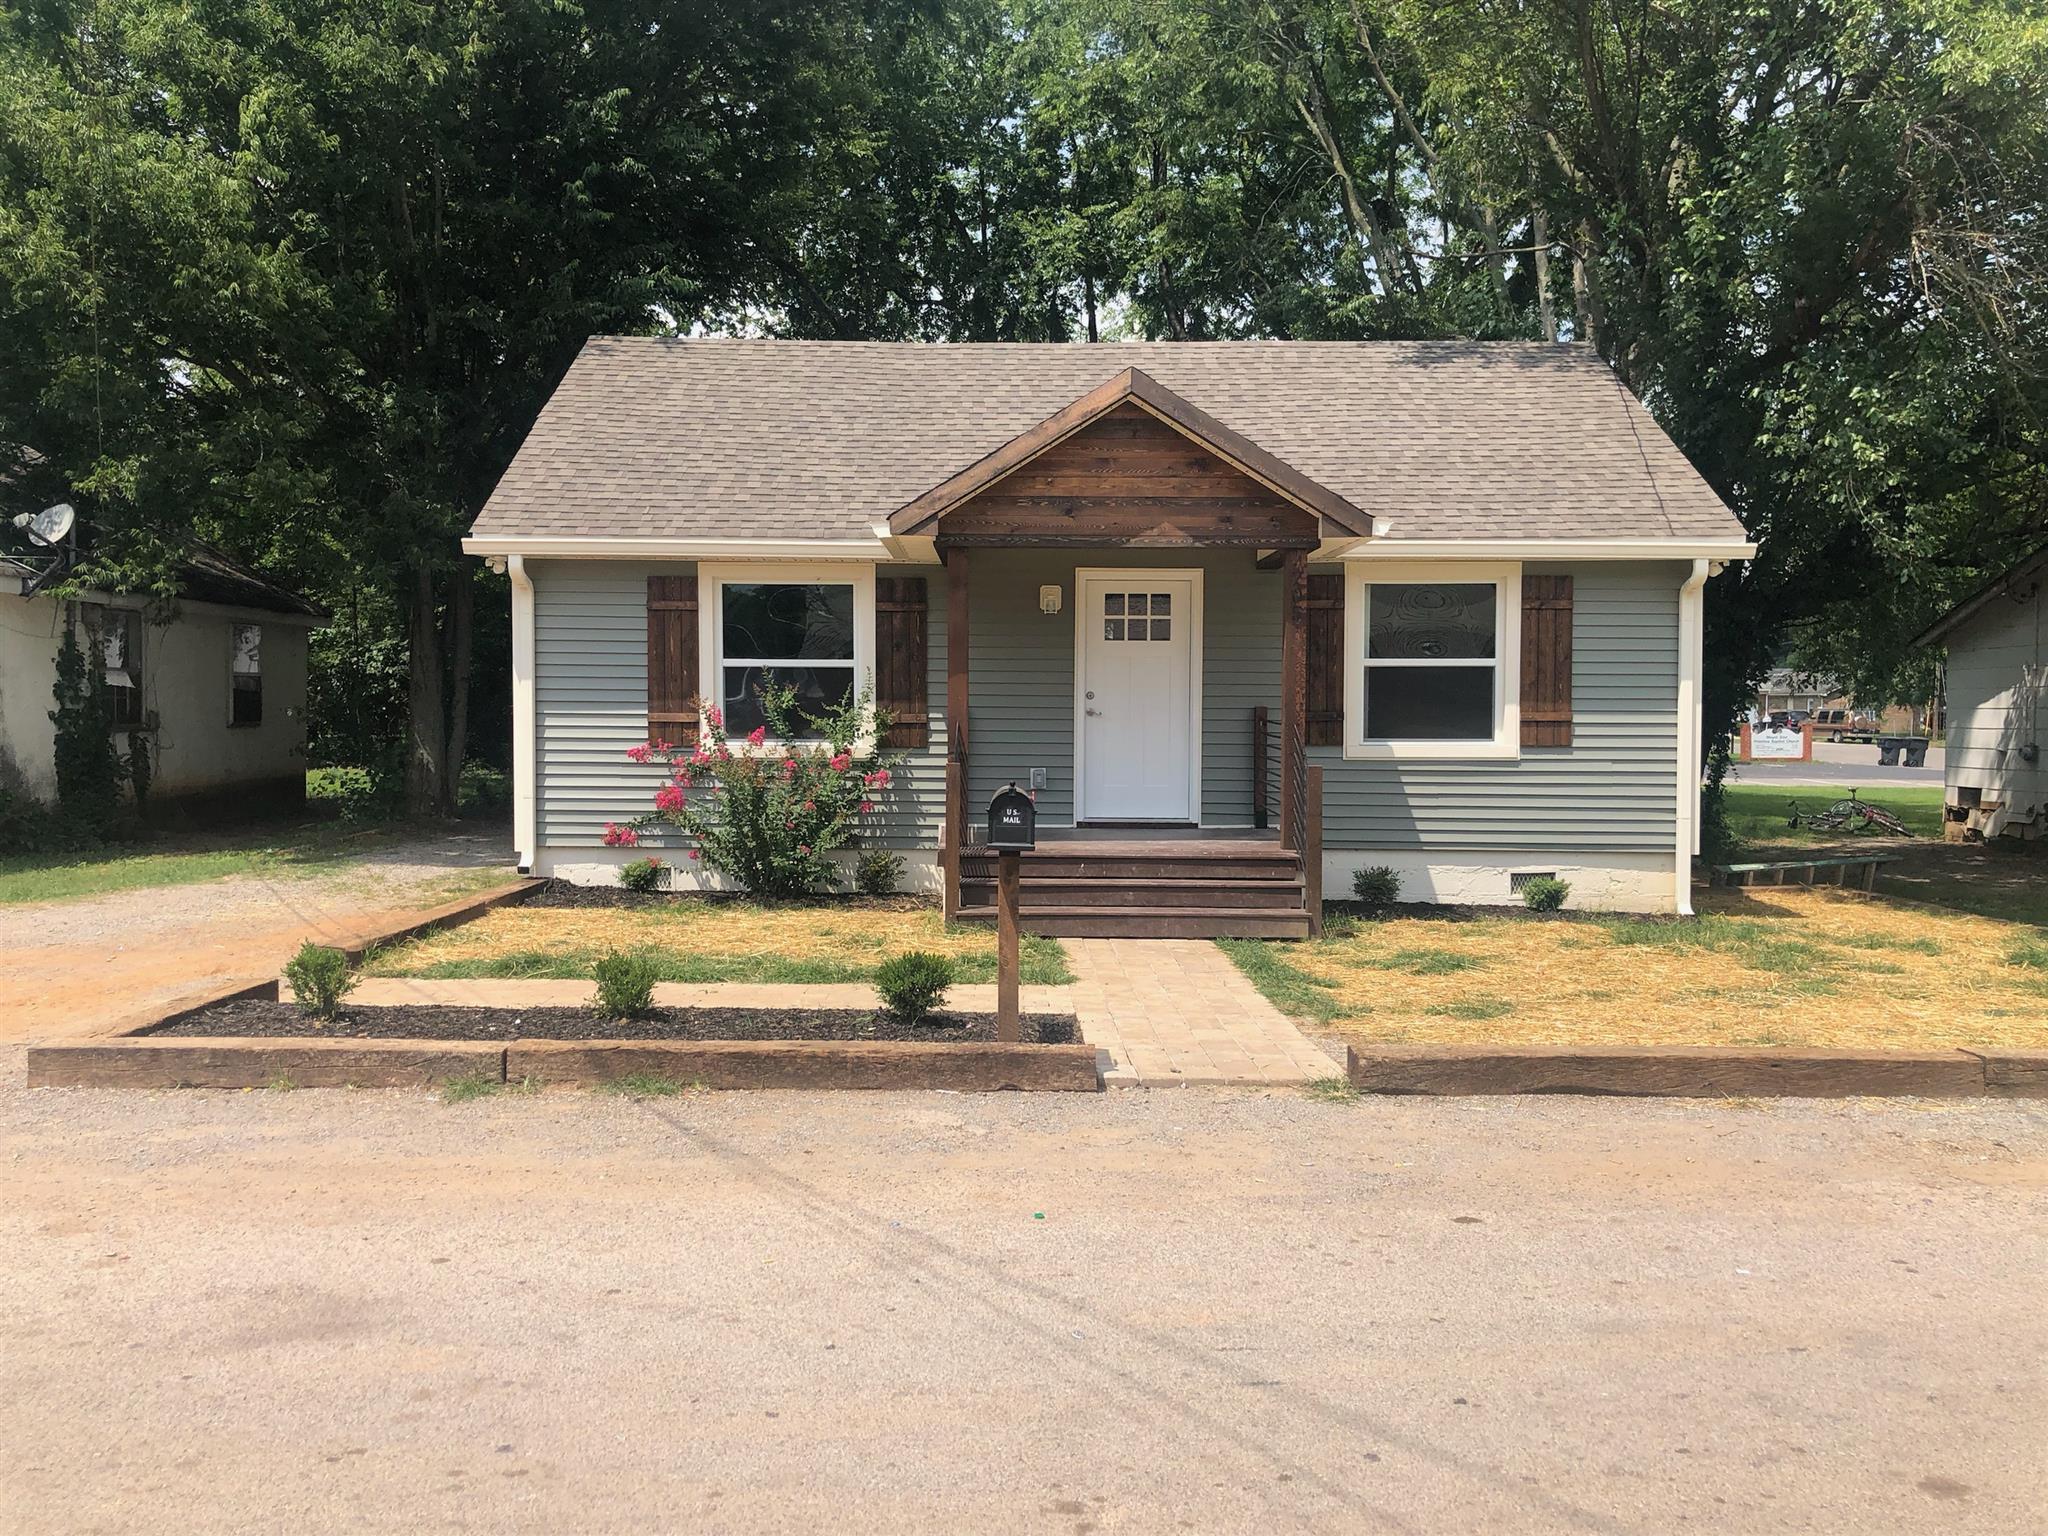 705 Minor St, Murfreesboro, TN 37130 - Murfreesboro, TN real estate listing